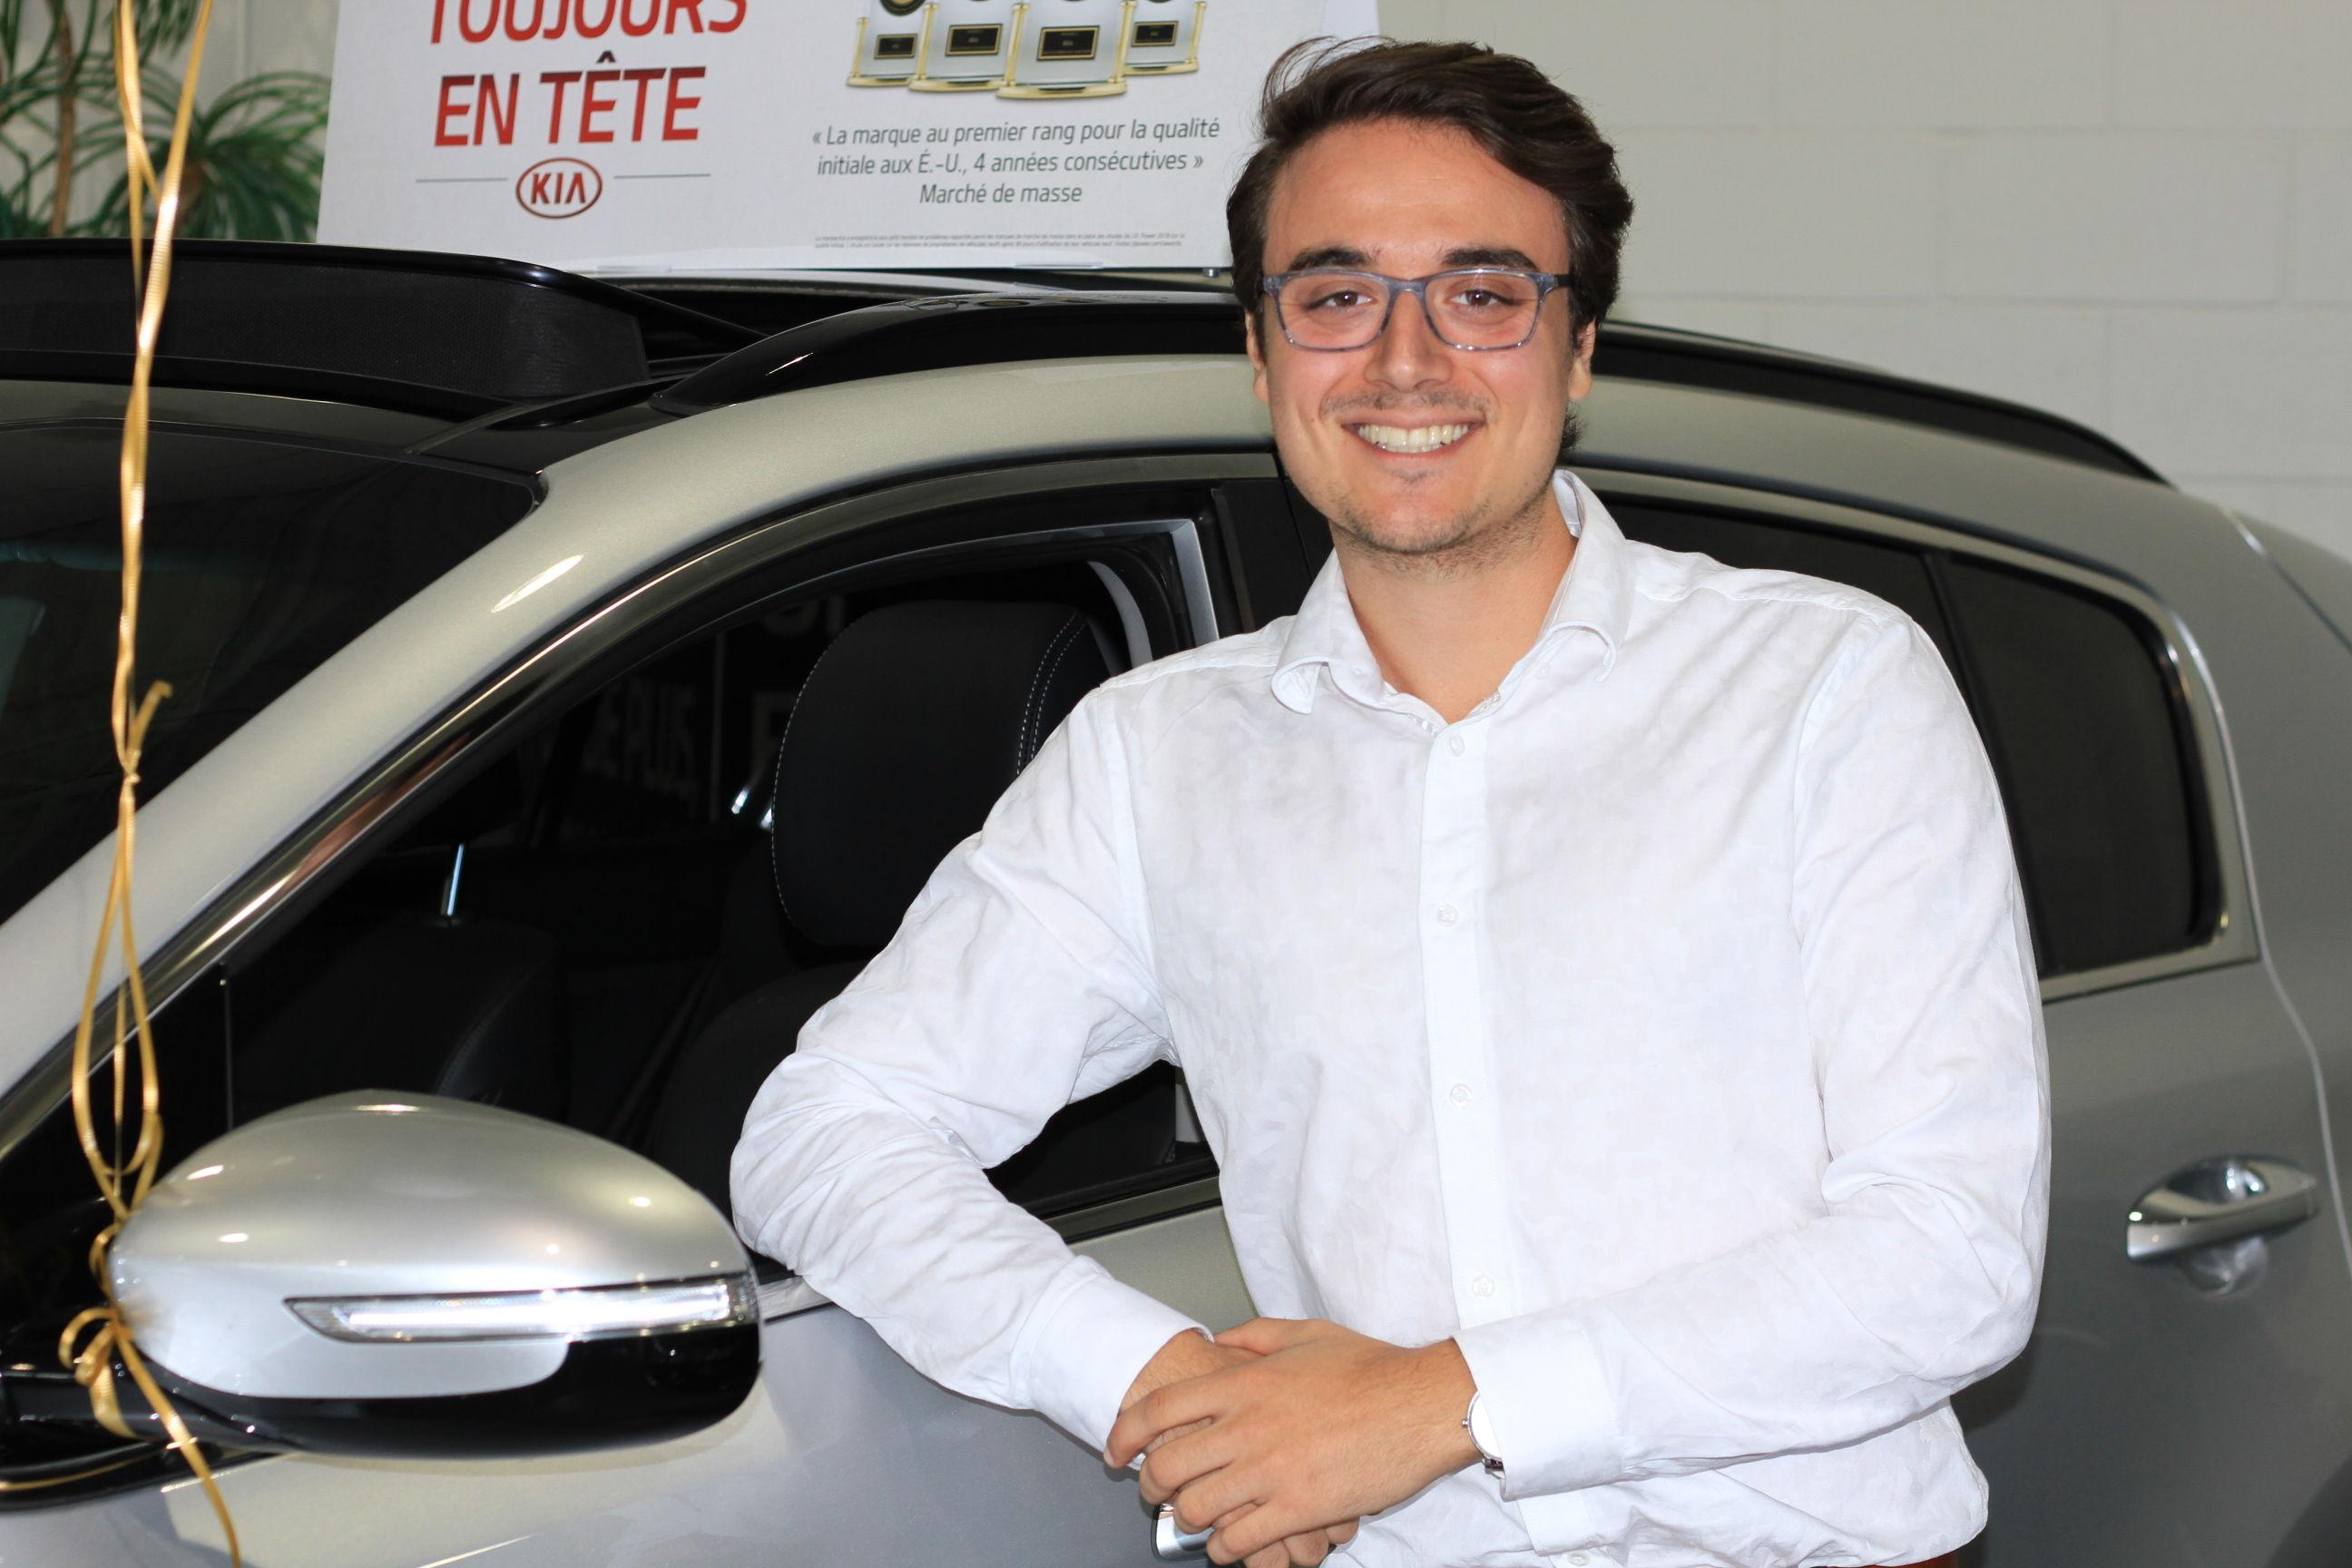 SébastienBlain